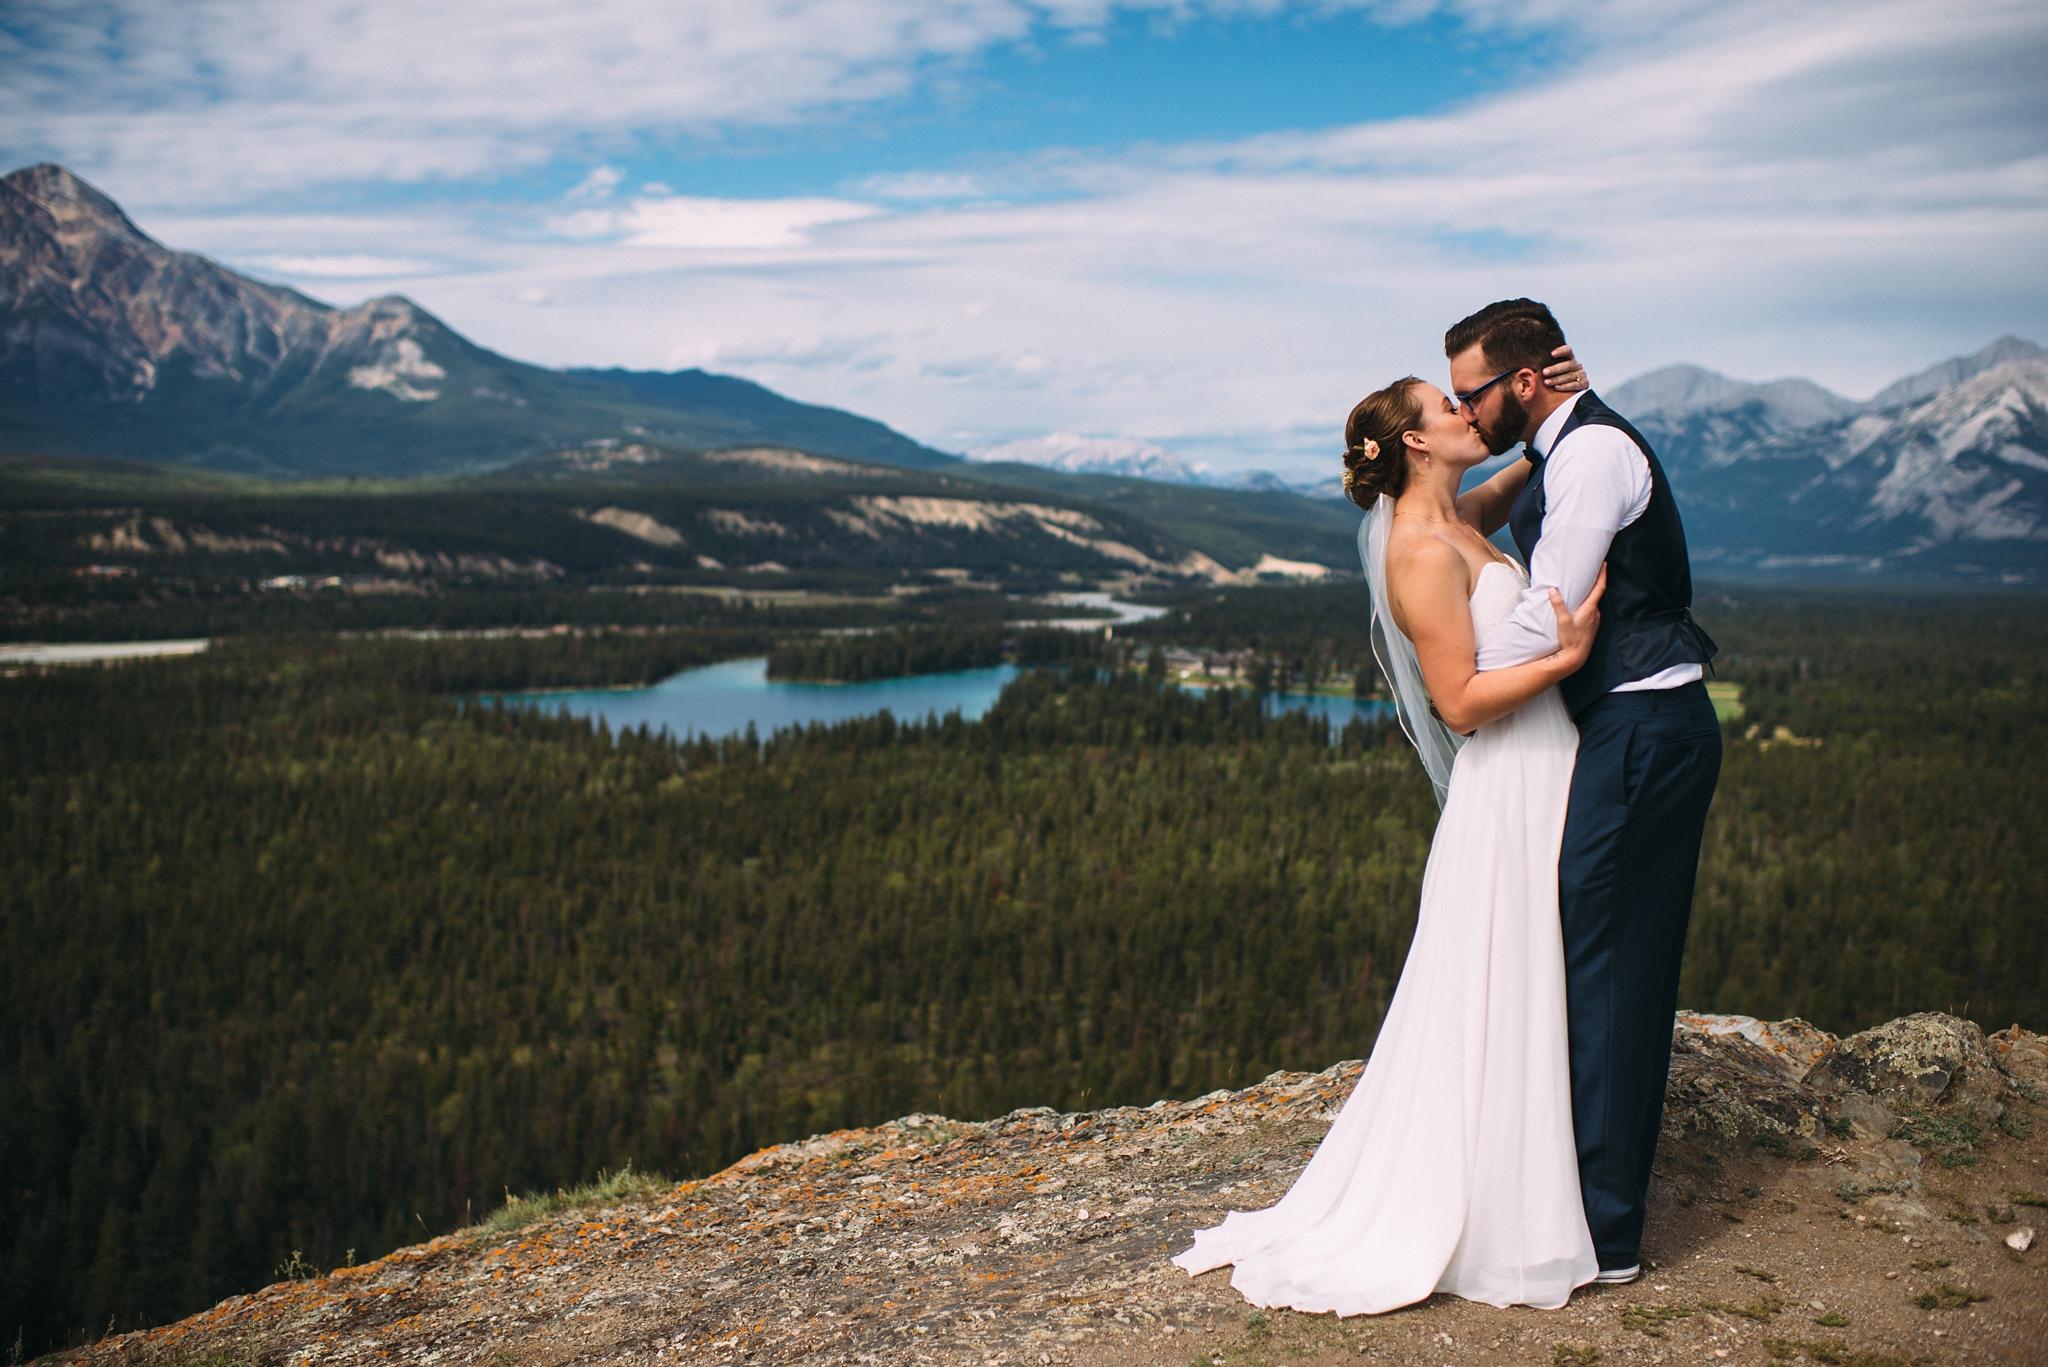 kaihla_tonai_intimate_wedding_elopement_photographer_2484